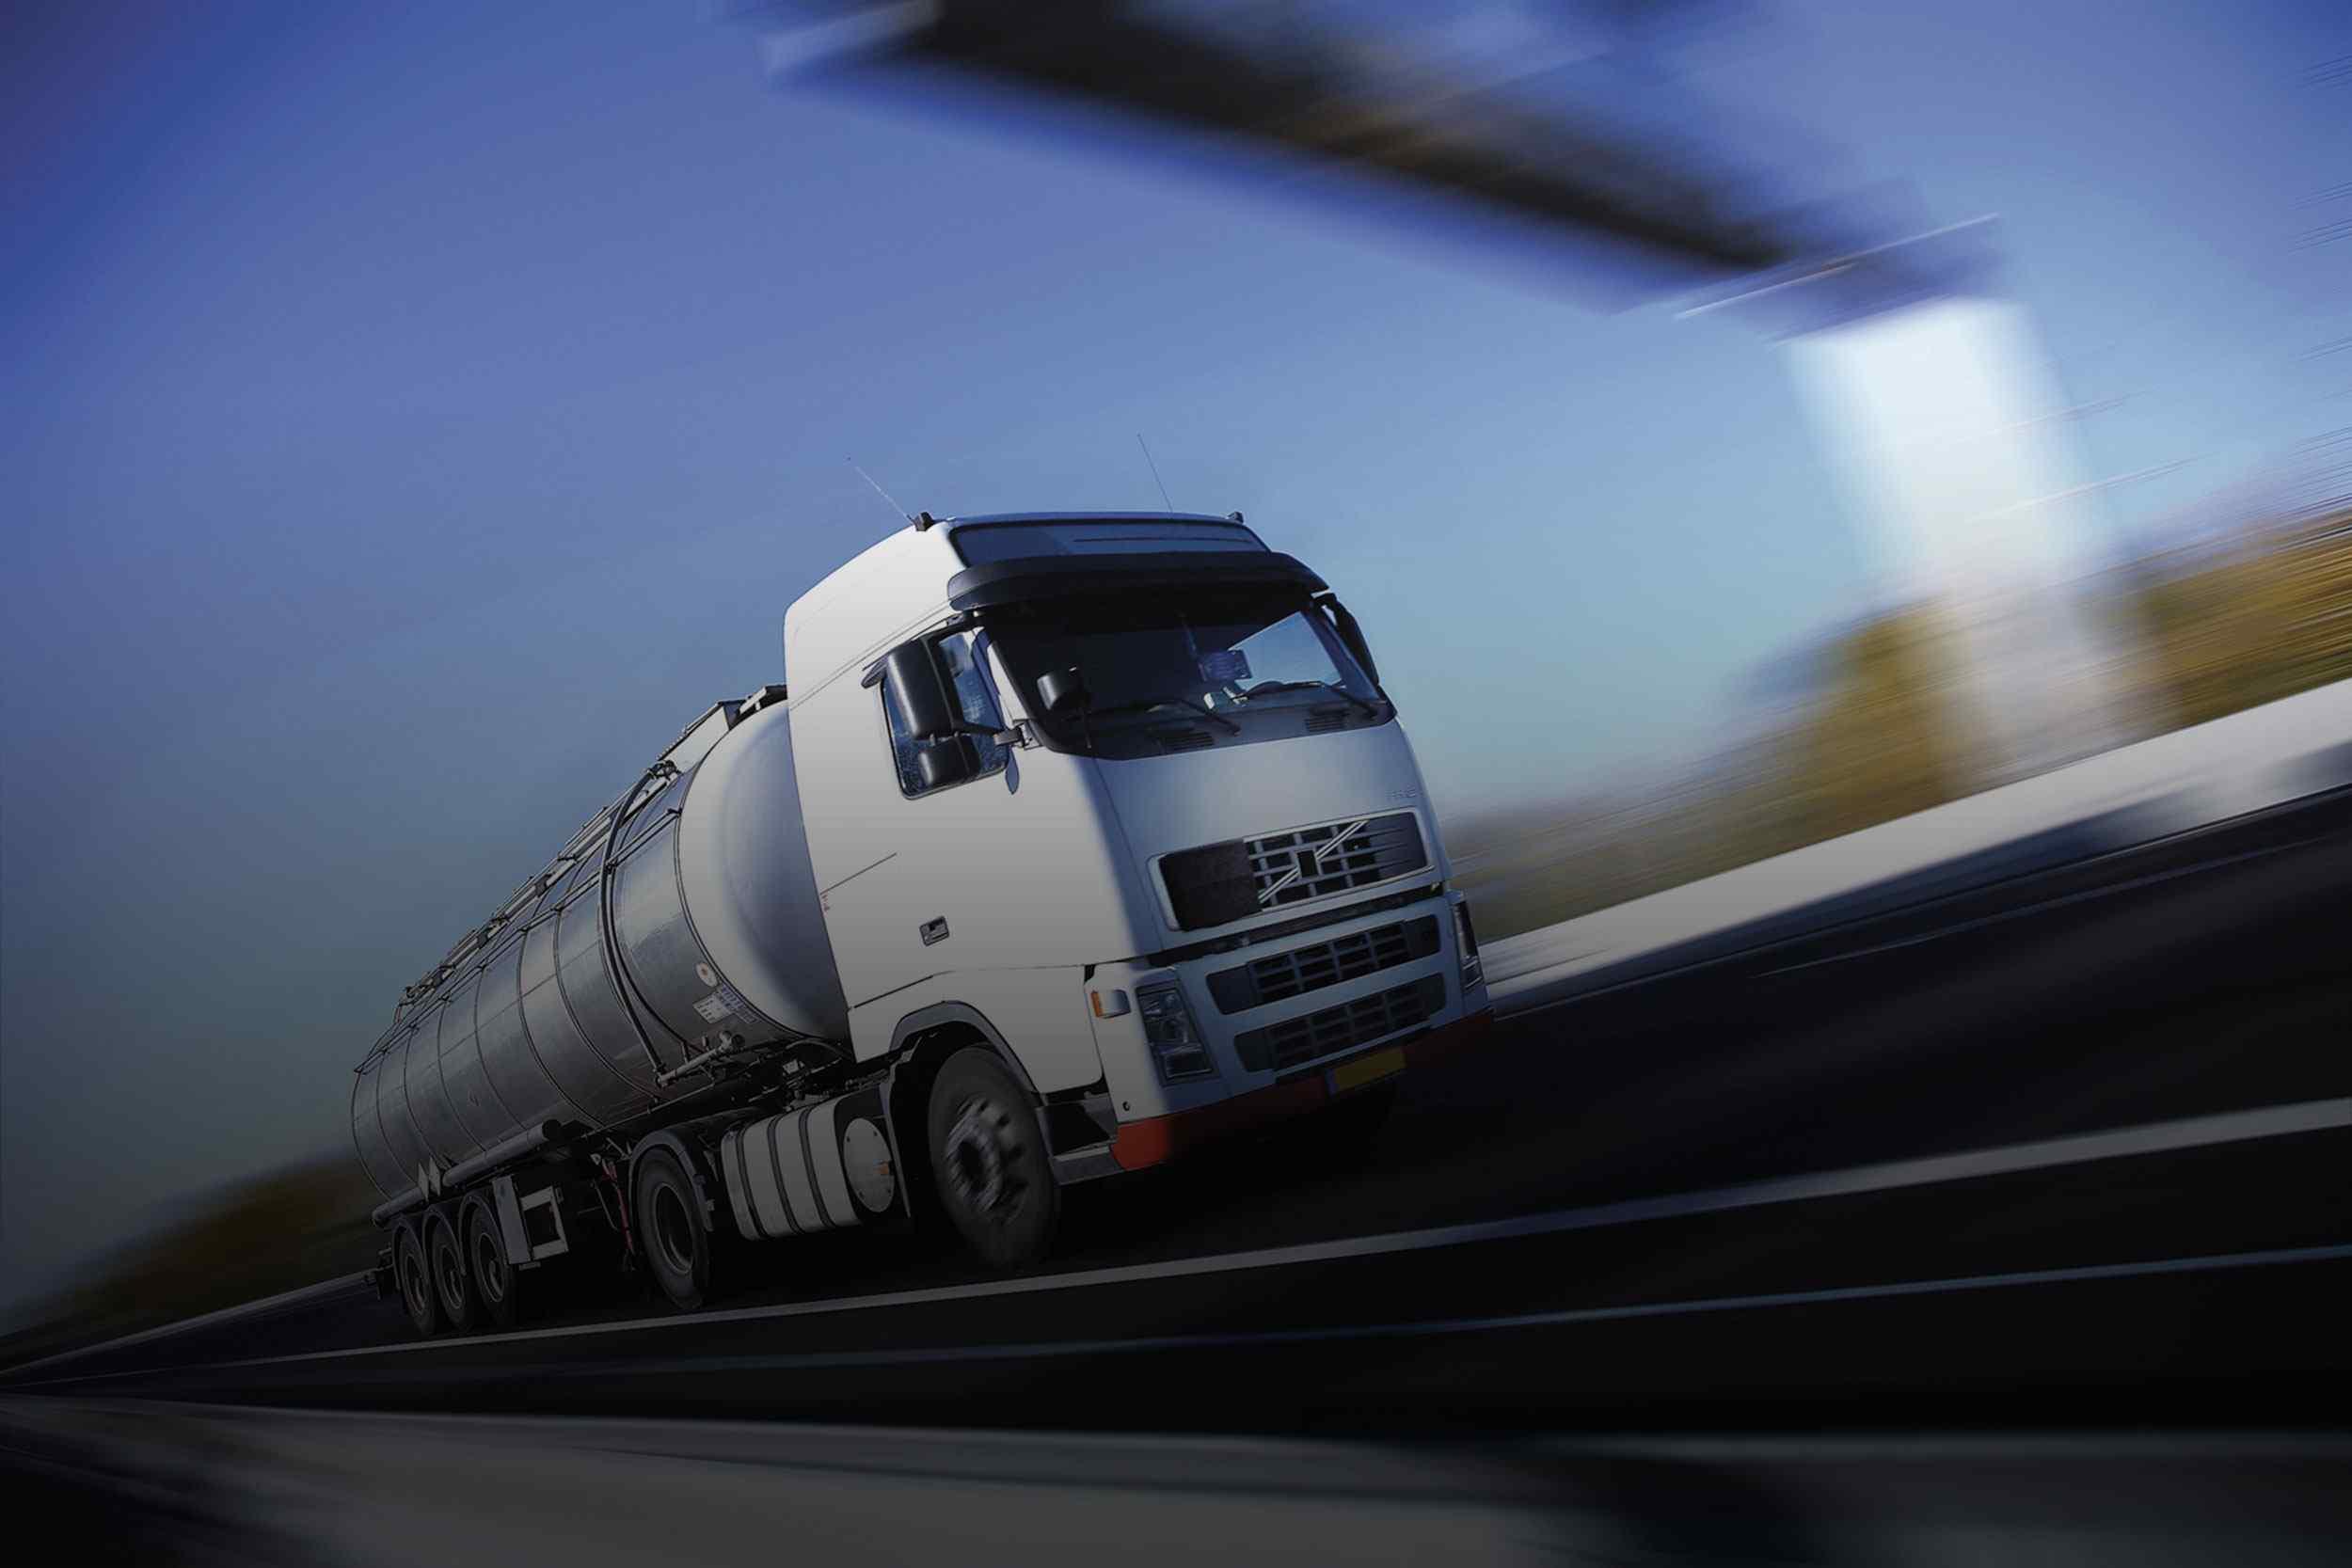 http://www.namyonglogistics.com/wp-content/uploads/2015/09/White-Truck-single.jpg